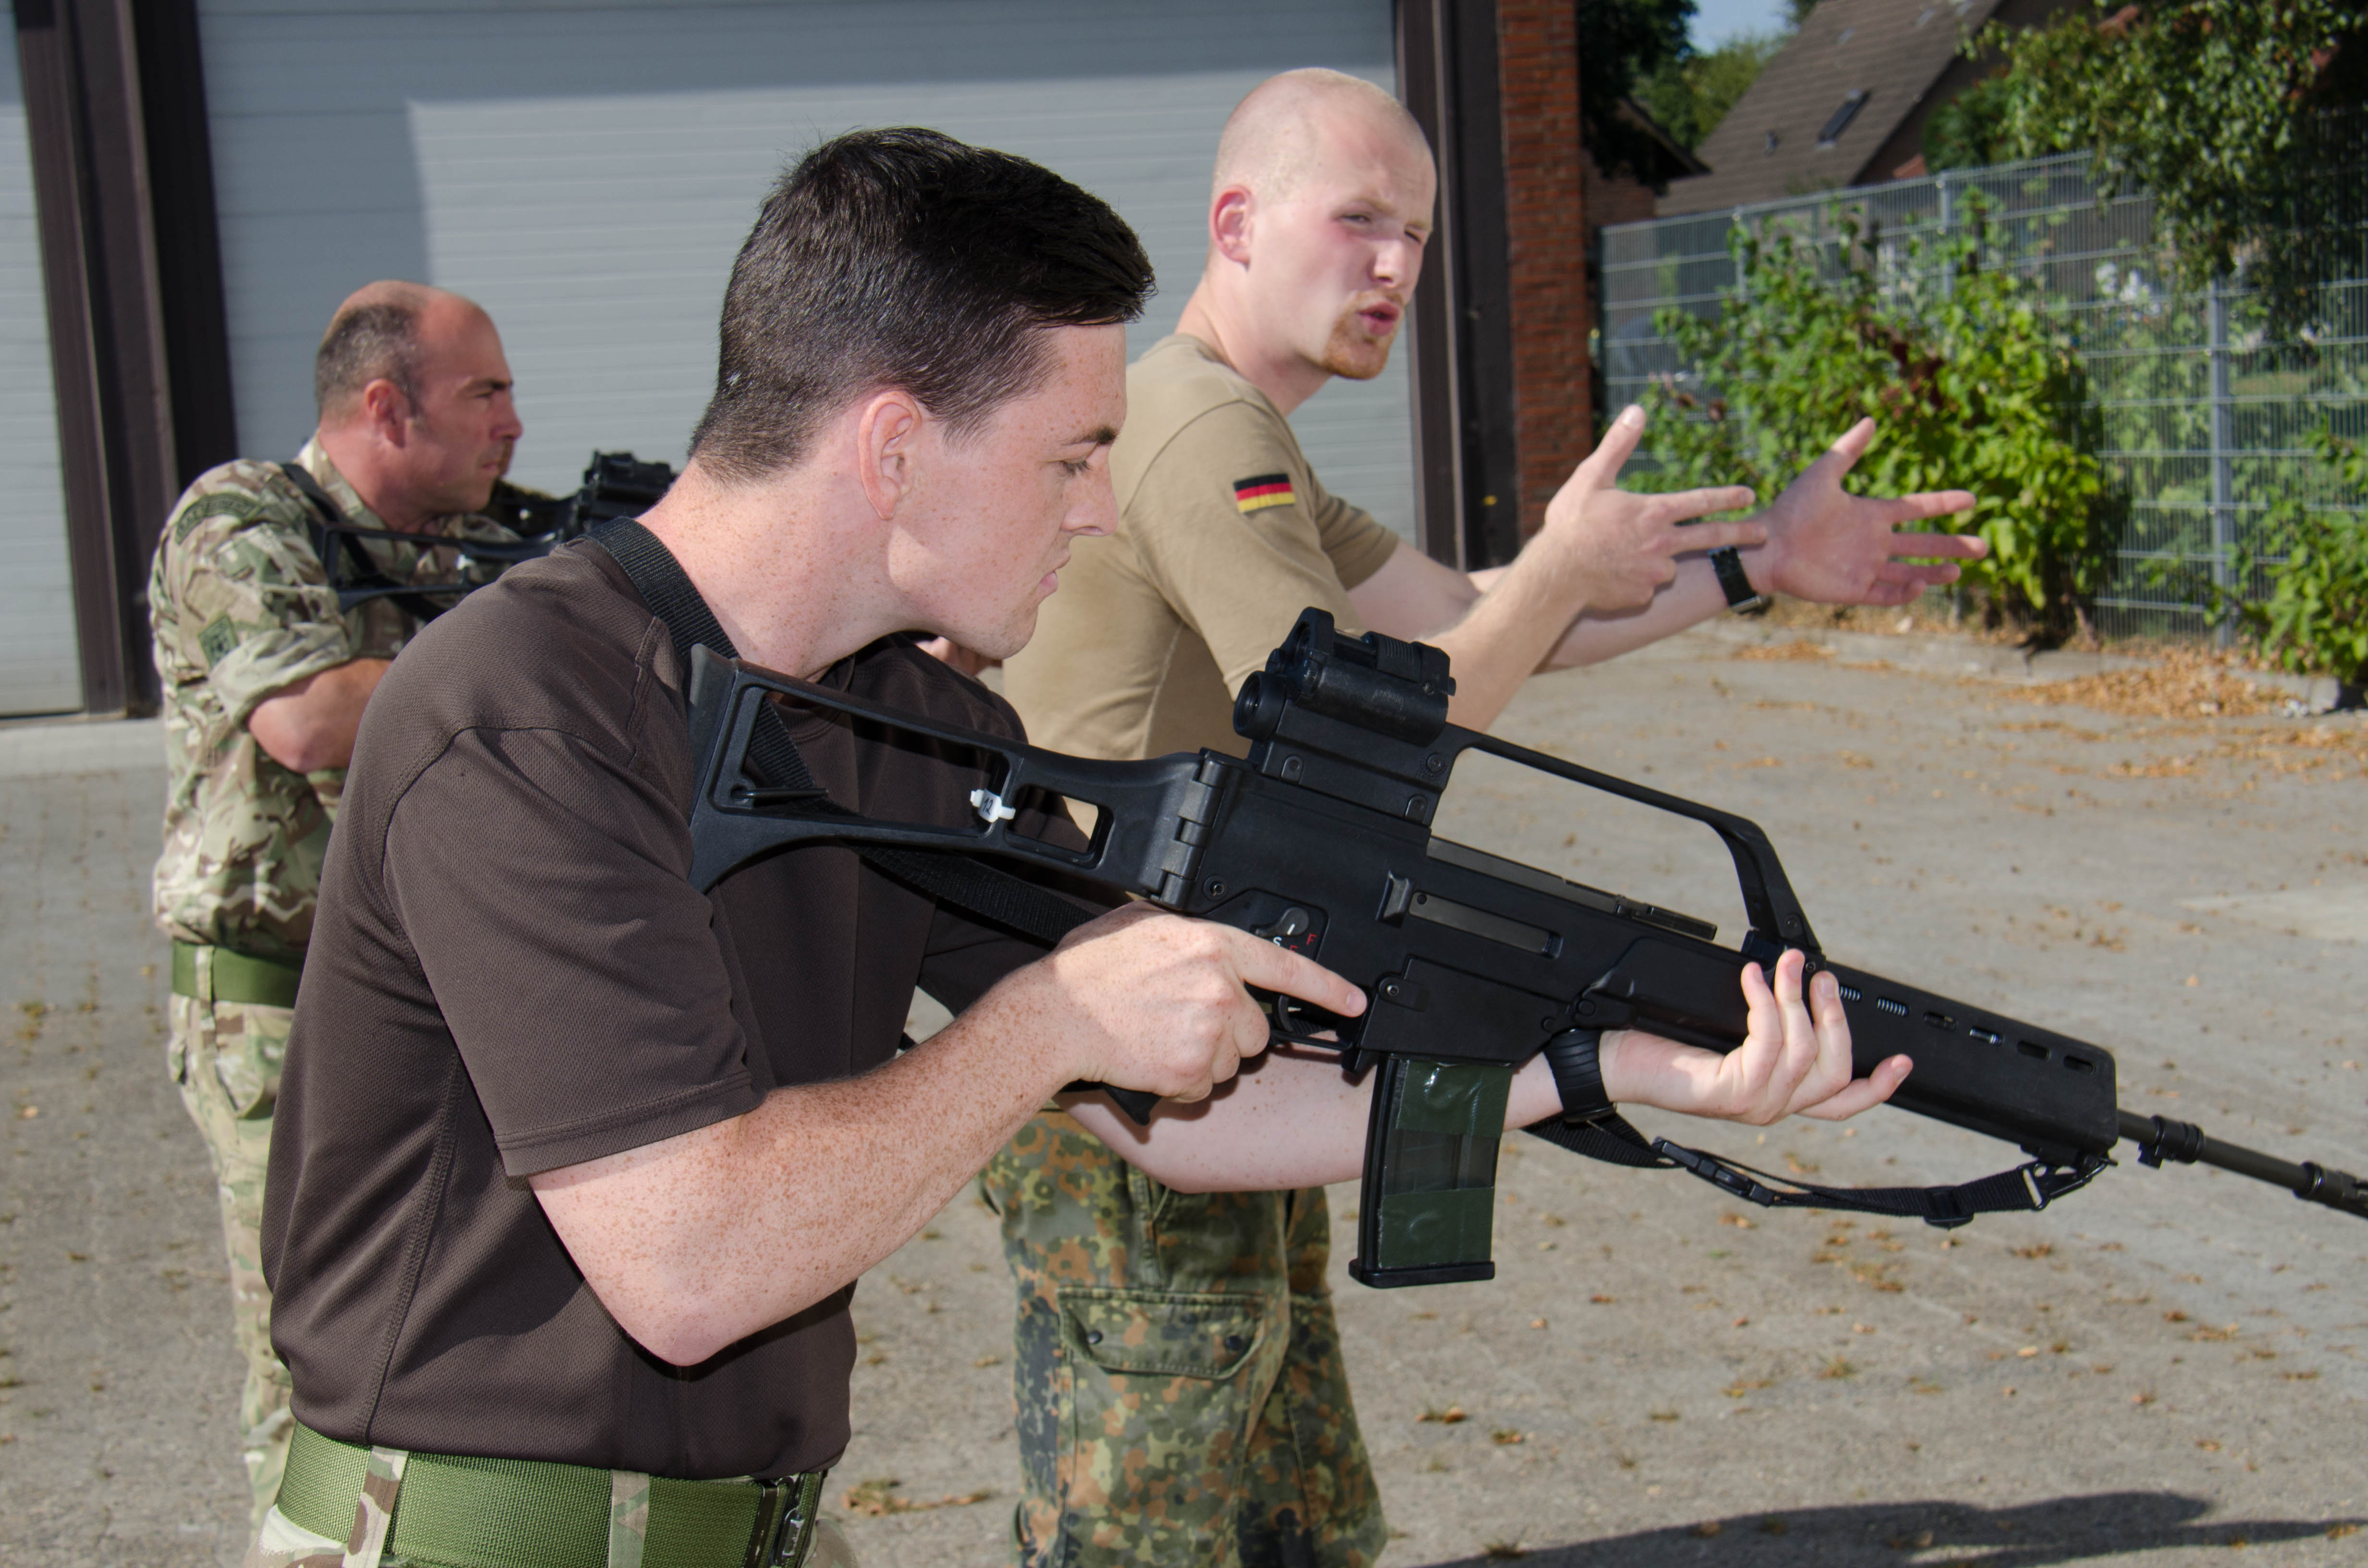 G36 Assault Rifle Training